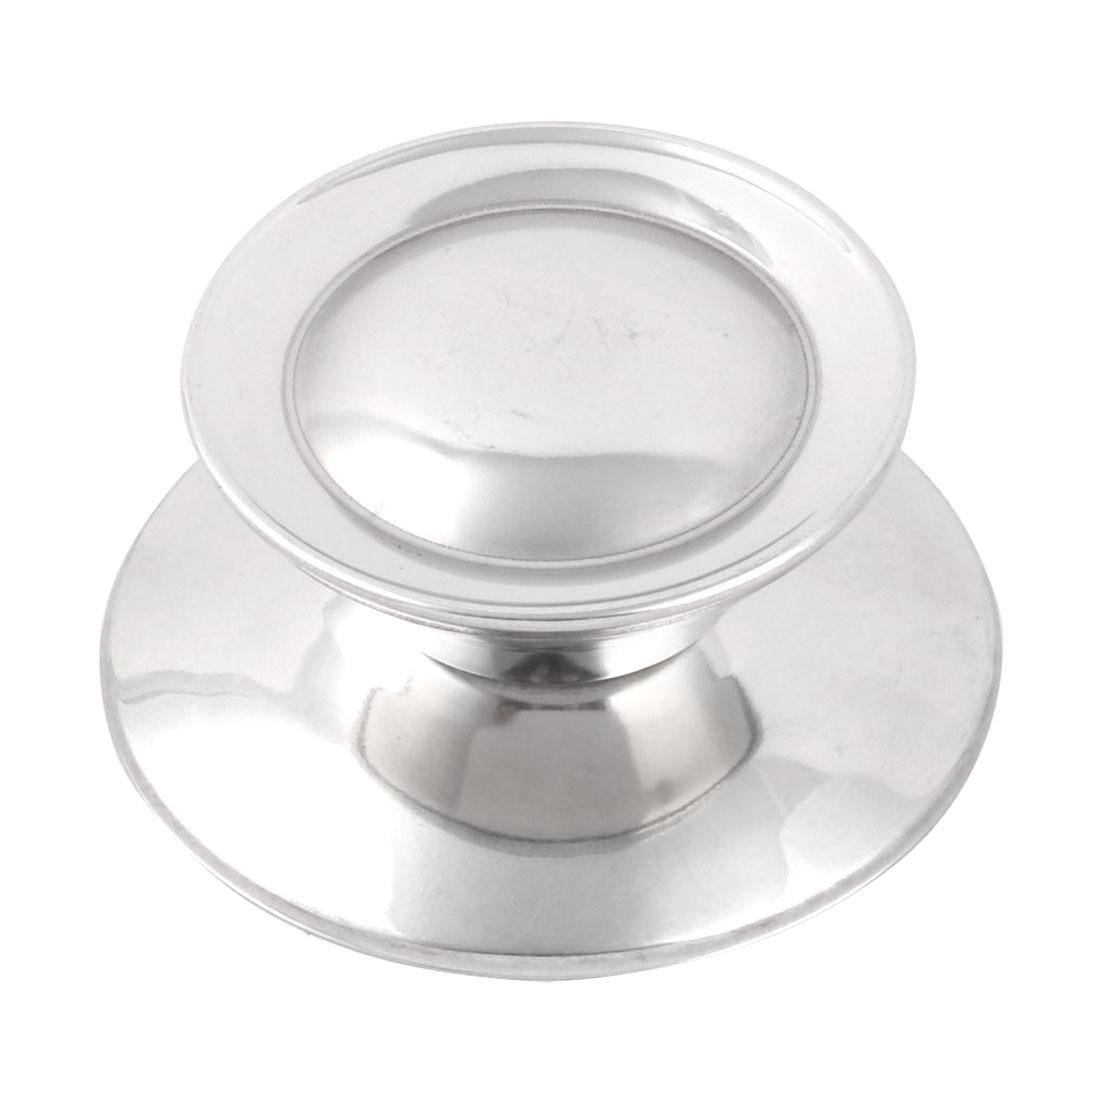 Kitchen Pot Cover Cooking Utensils Circle Lid Holding Knobs Handle 6.2cm Dia 2 PCS